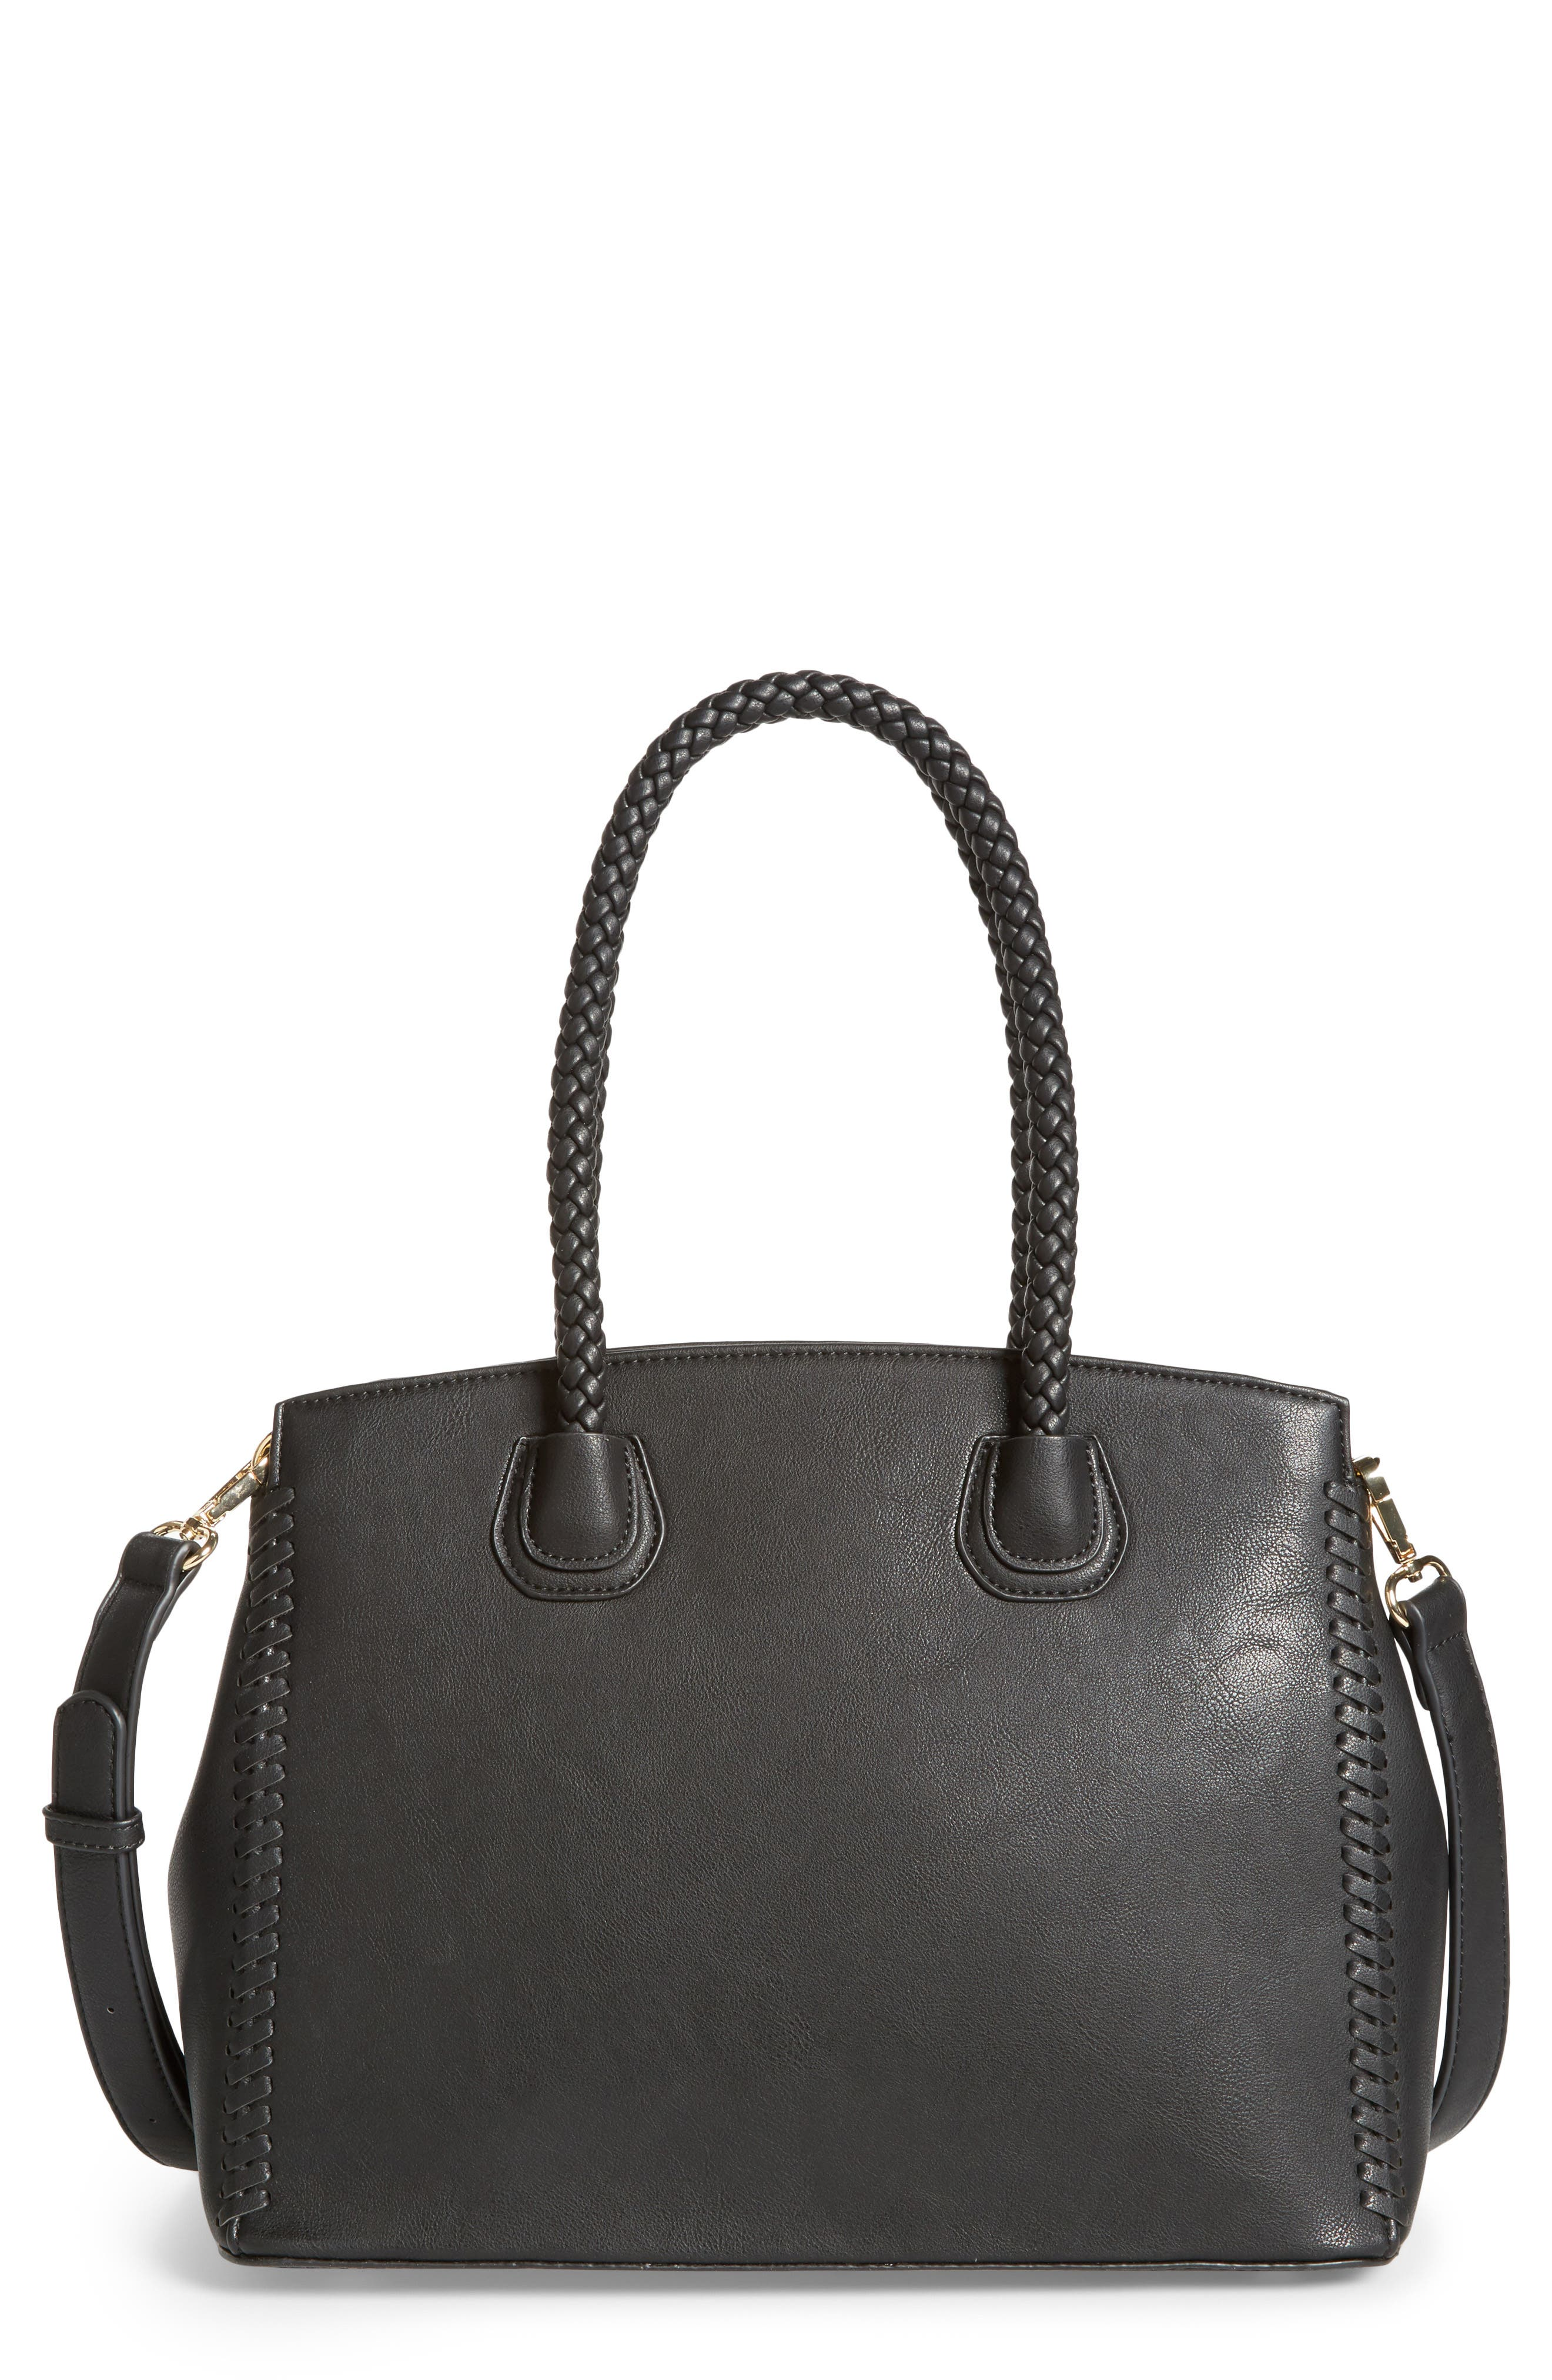 Main Image - Sole Society Lexington Whipstitch Faux Leather Satchel